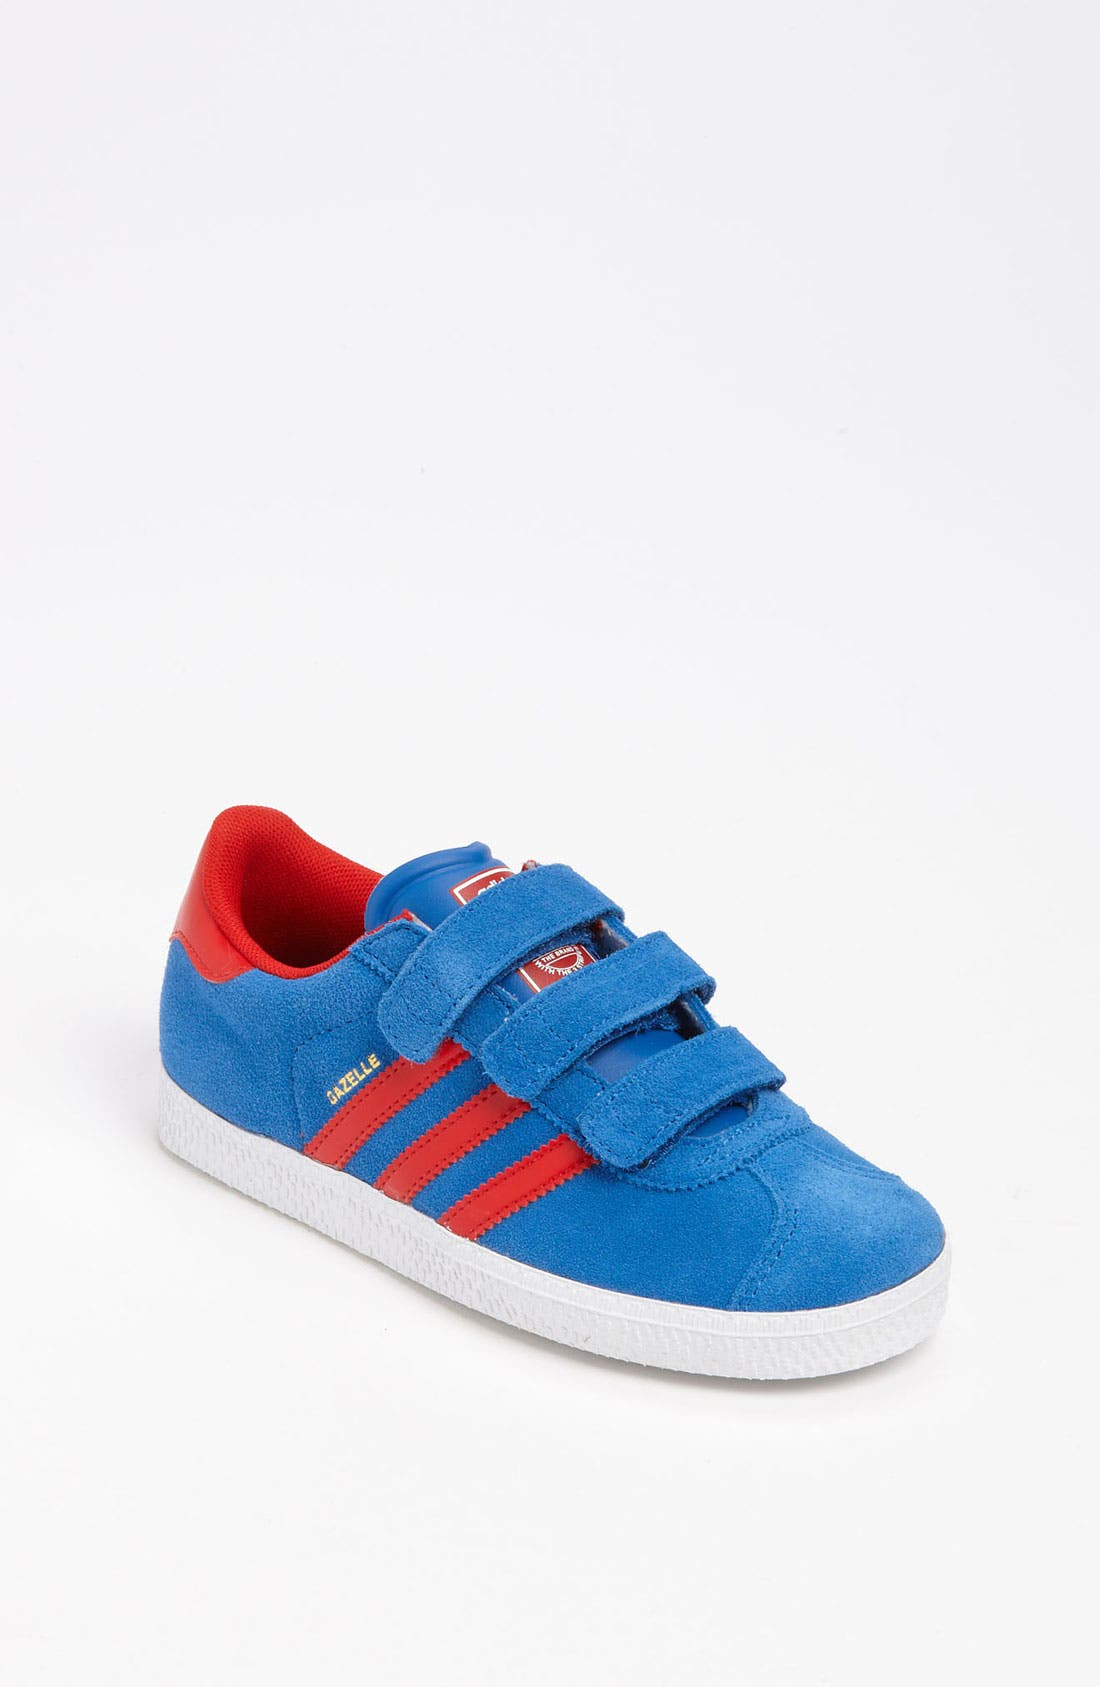 Alternate Image 1 Selected - adidas 'Gazelle 2' Sneaker (Toddler & Little Kid)